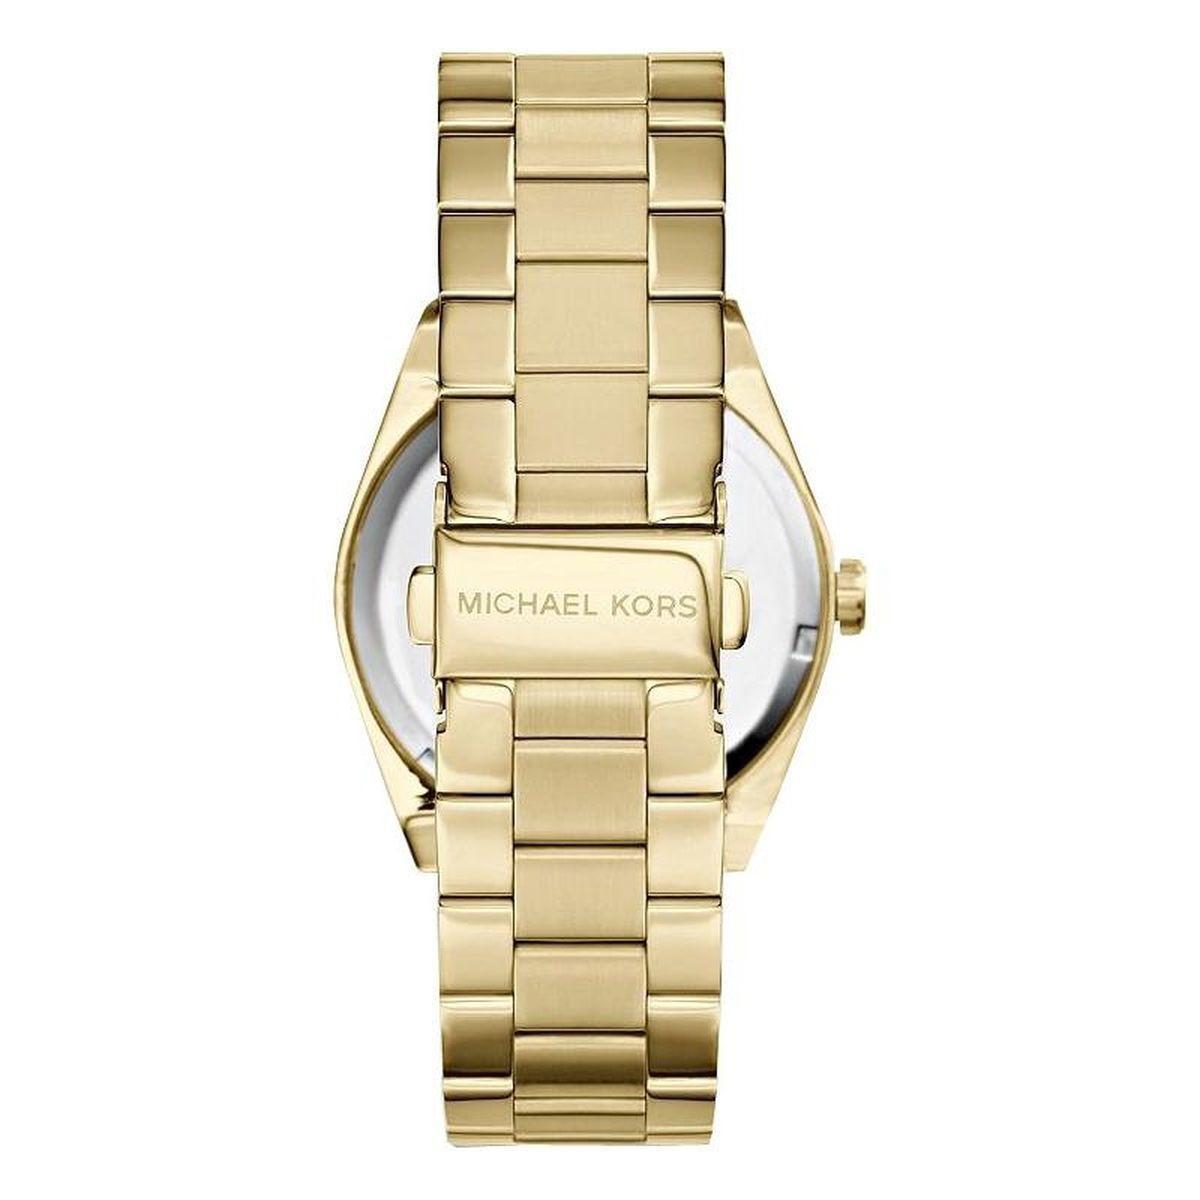 4c5d0e6eb73 Relógio michael kors feminino mk5894 - Relógio Feminino - Magazine Luiza